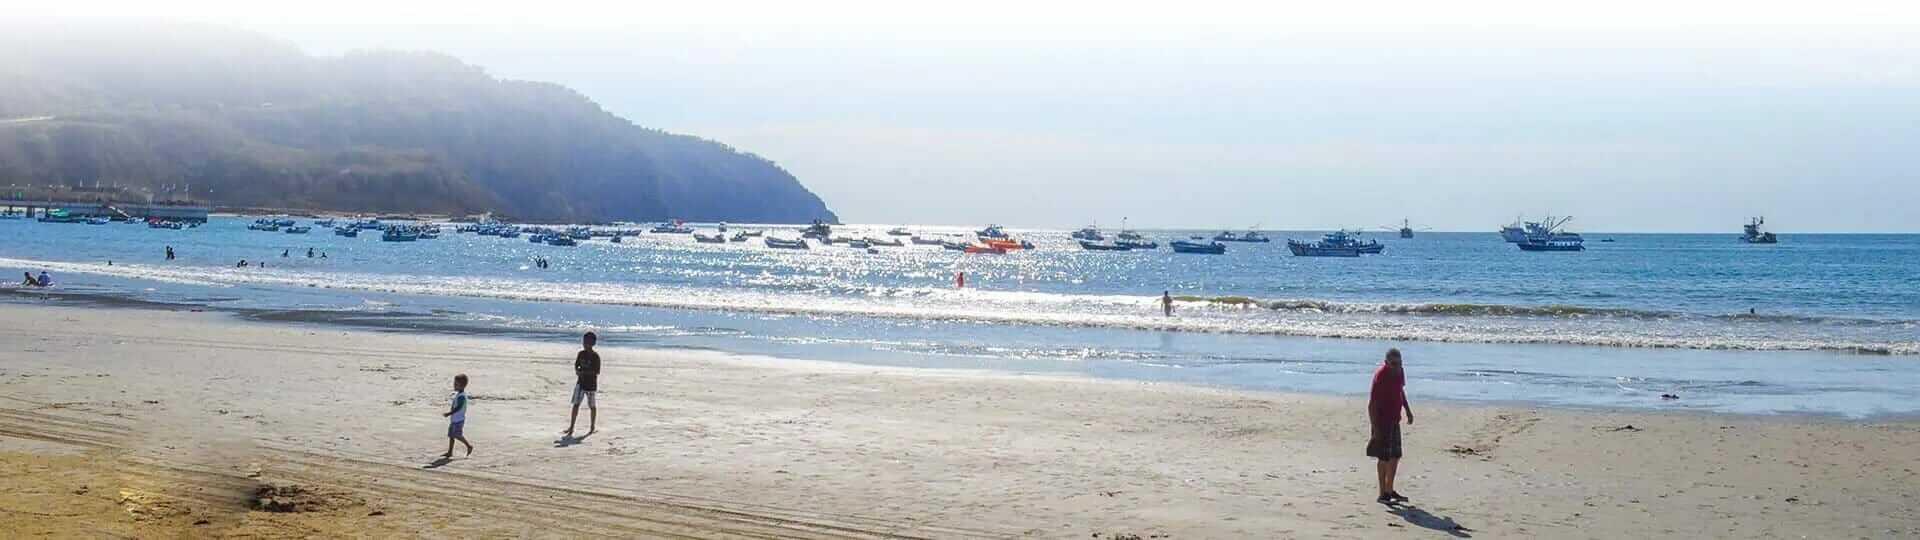 machalilla ecuador beach